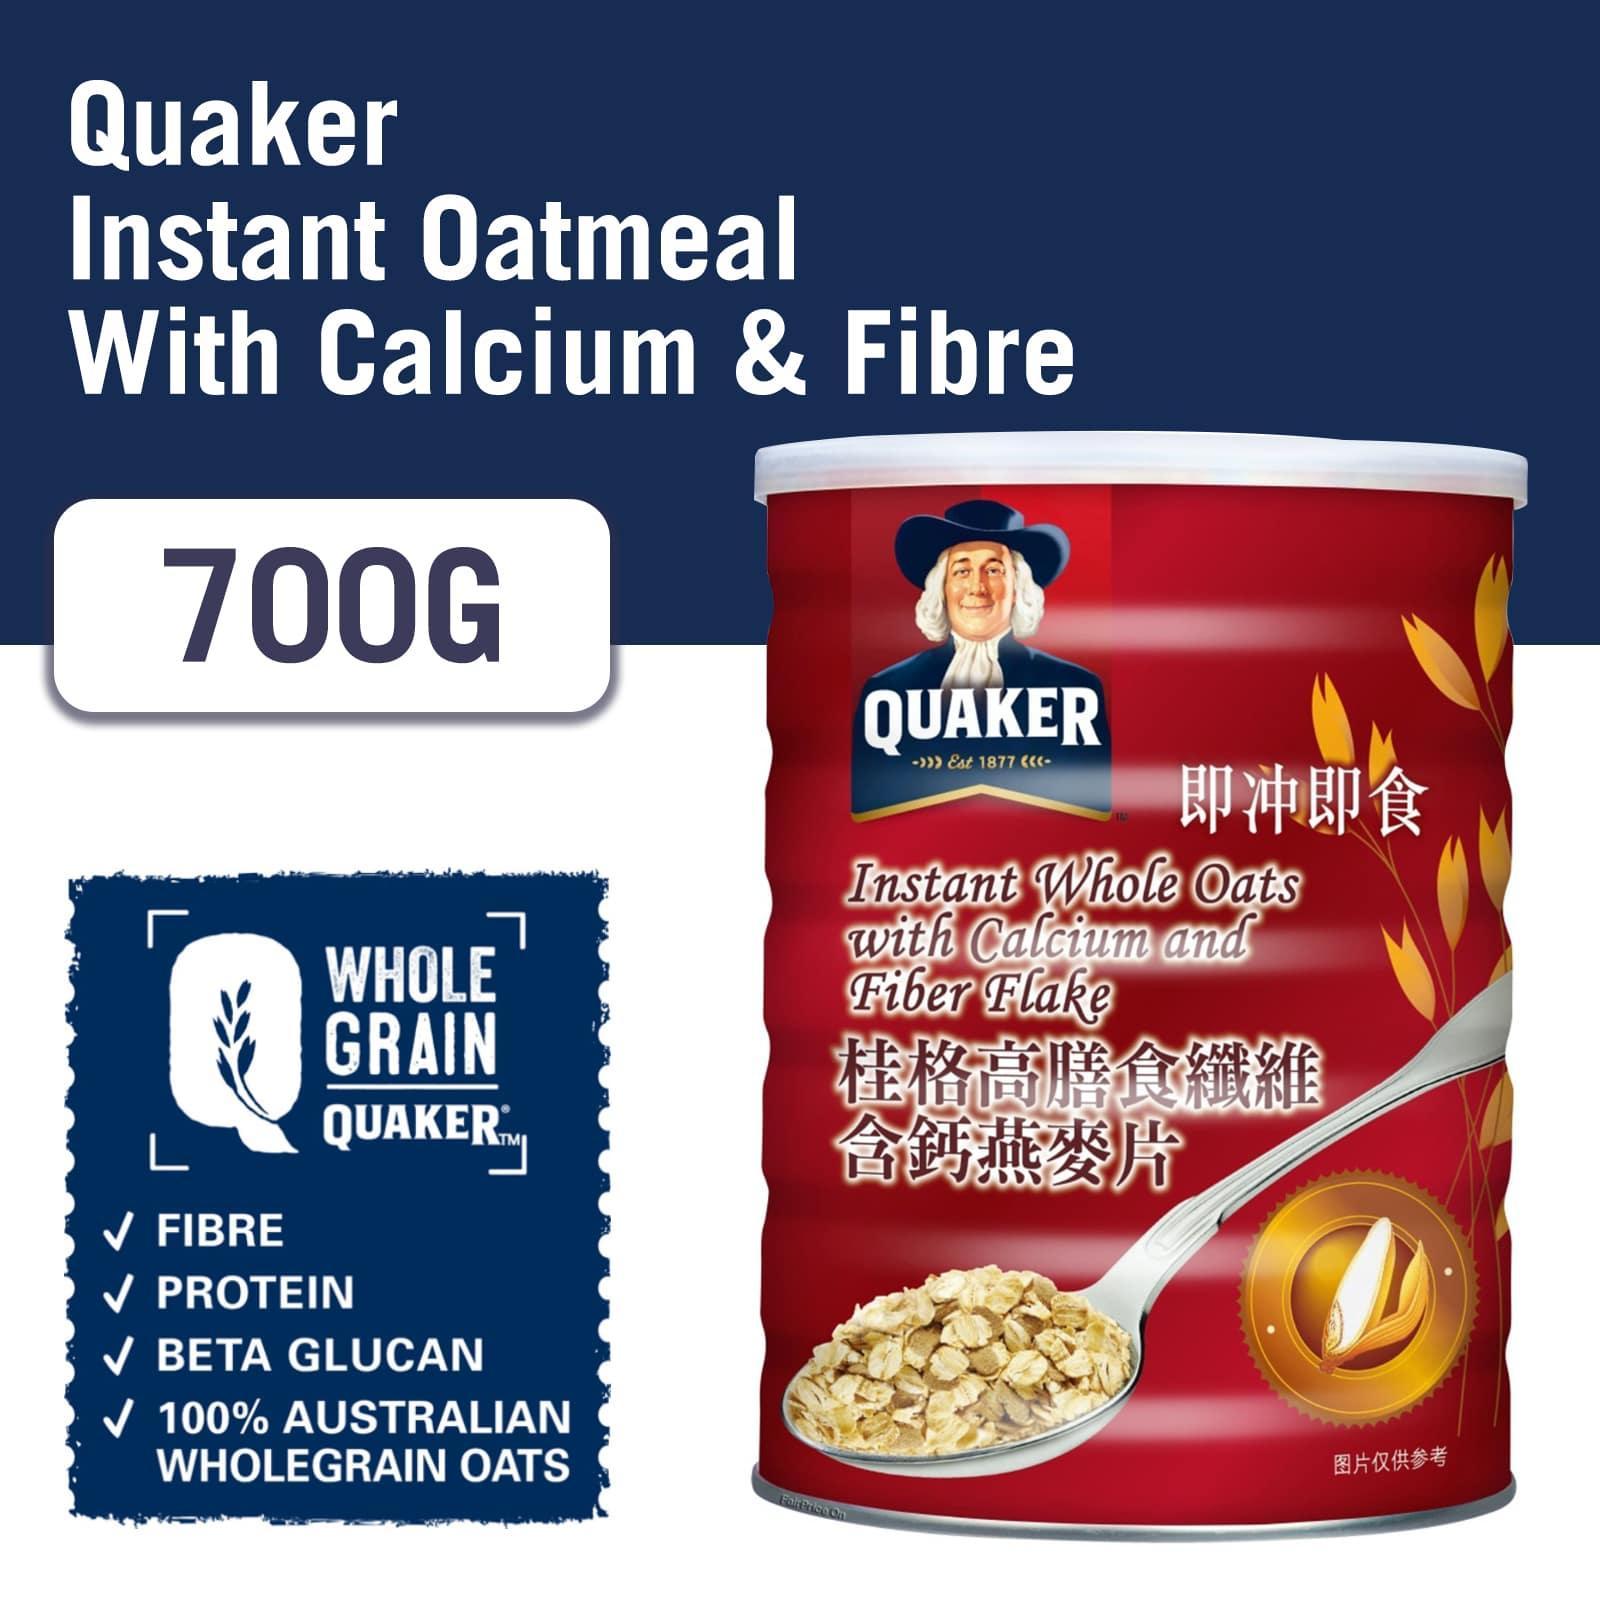 QUAKER Instant Oatmeal with Calcium and Fibre (Tin)